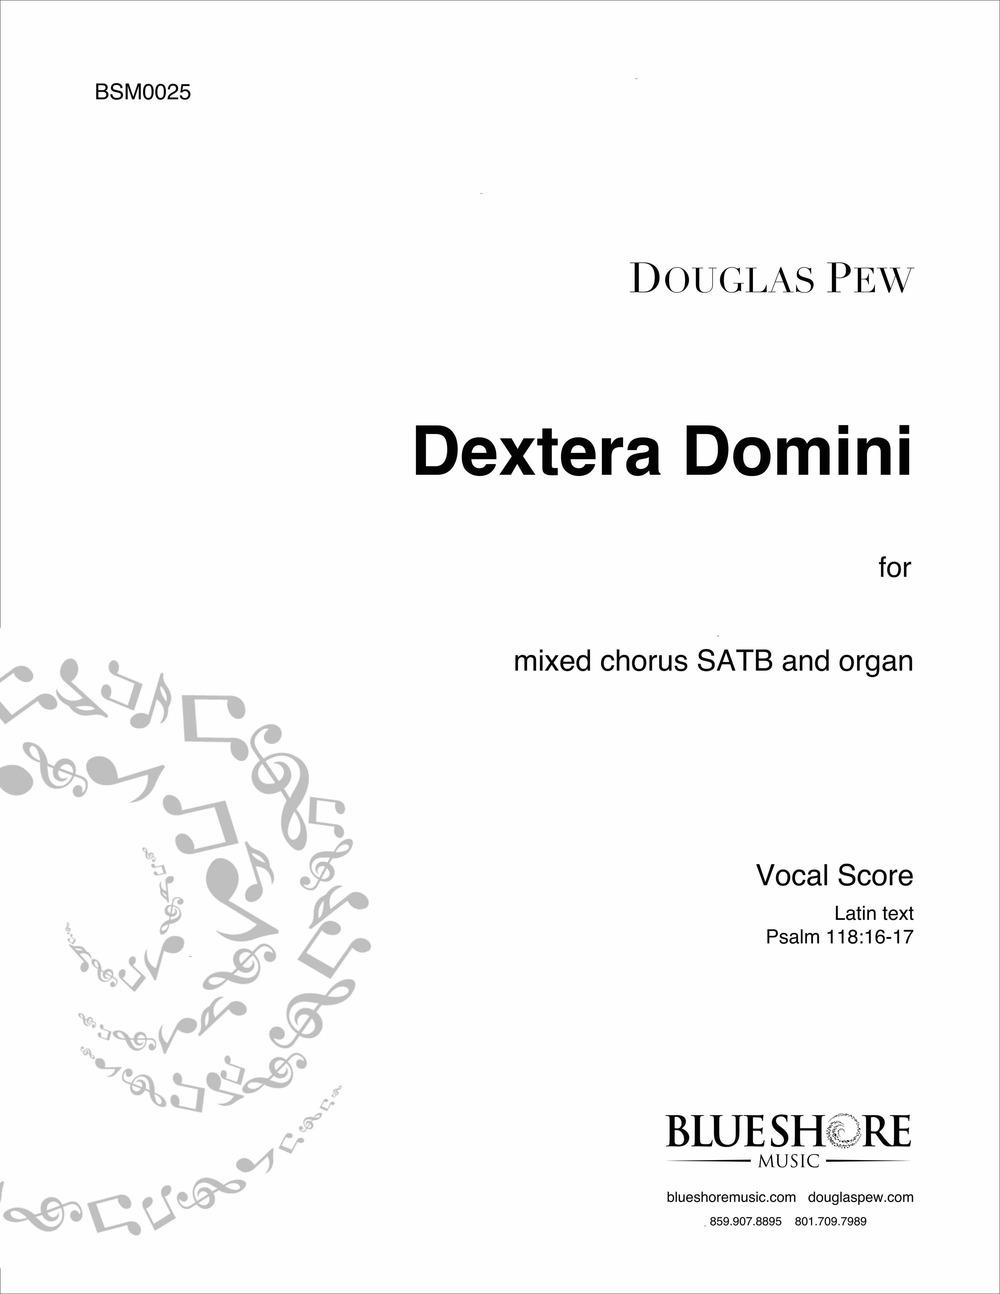 Dextera Domini  - SATB and Organ